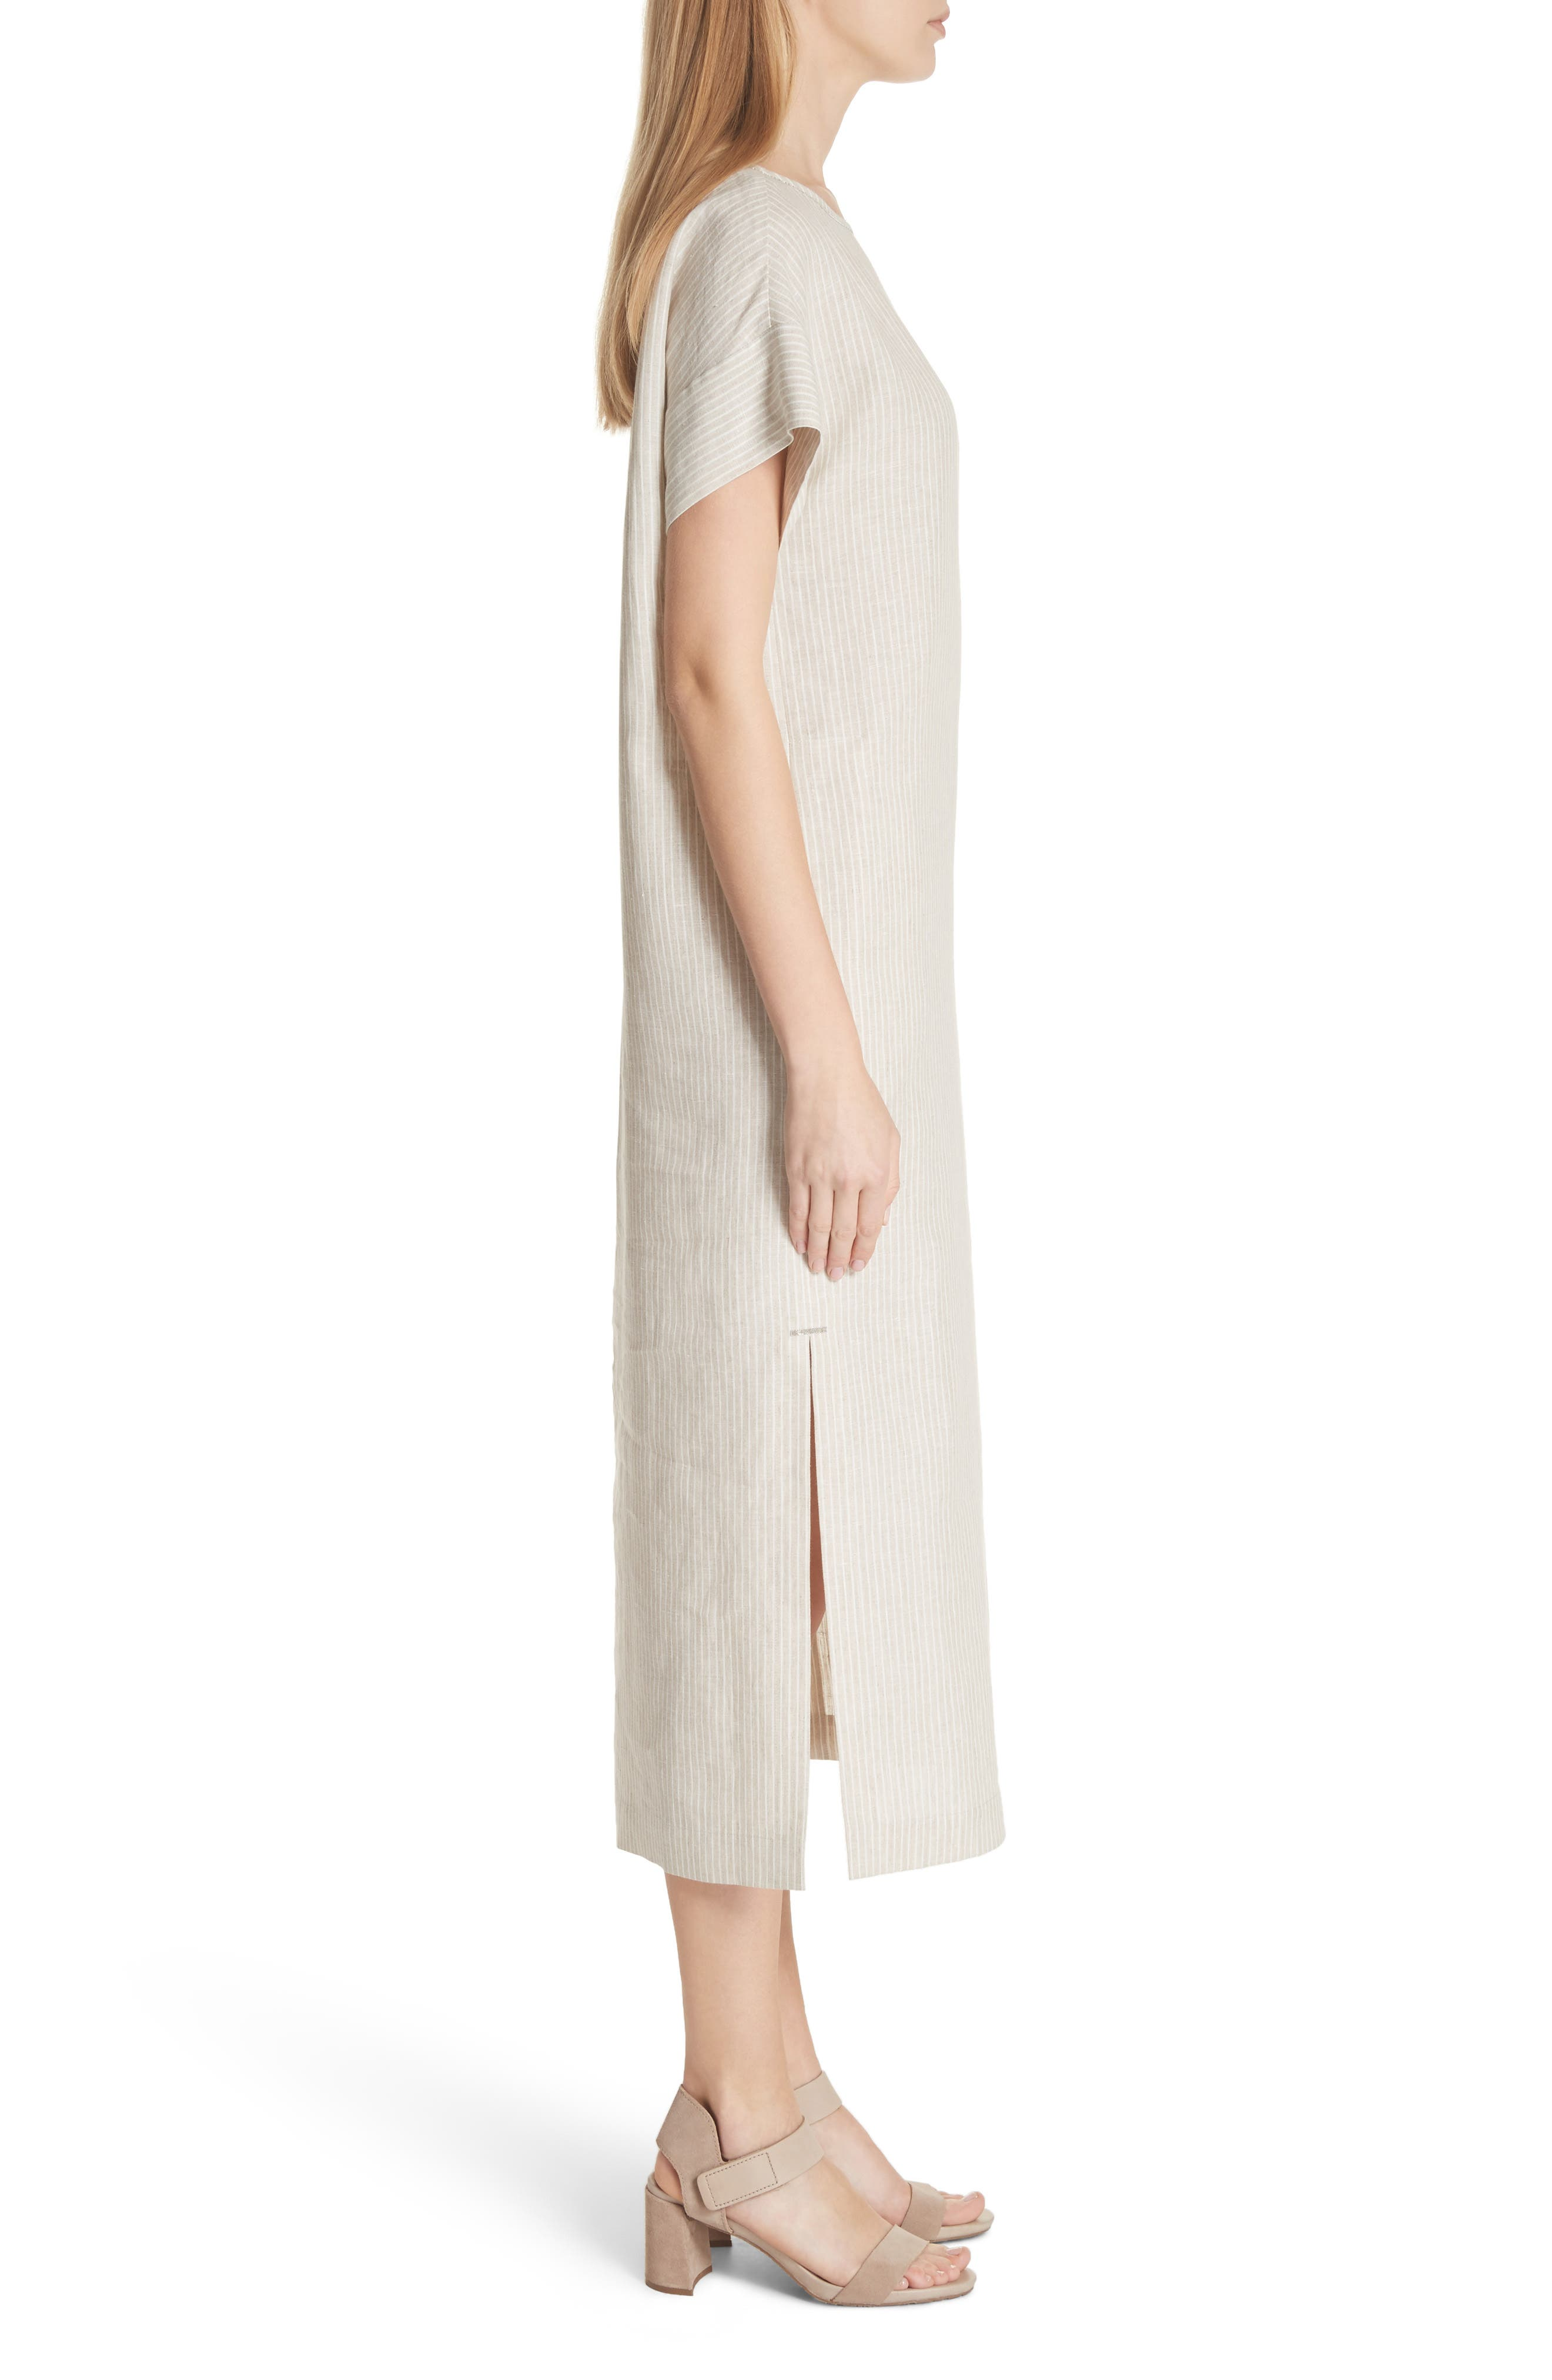 LAFAYETTE 148 NEW YORK,                             Emiline Stripe Linen Dress,                             Alternate thumbnail 3, color,                             251